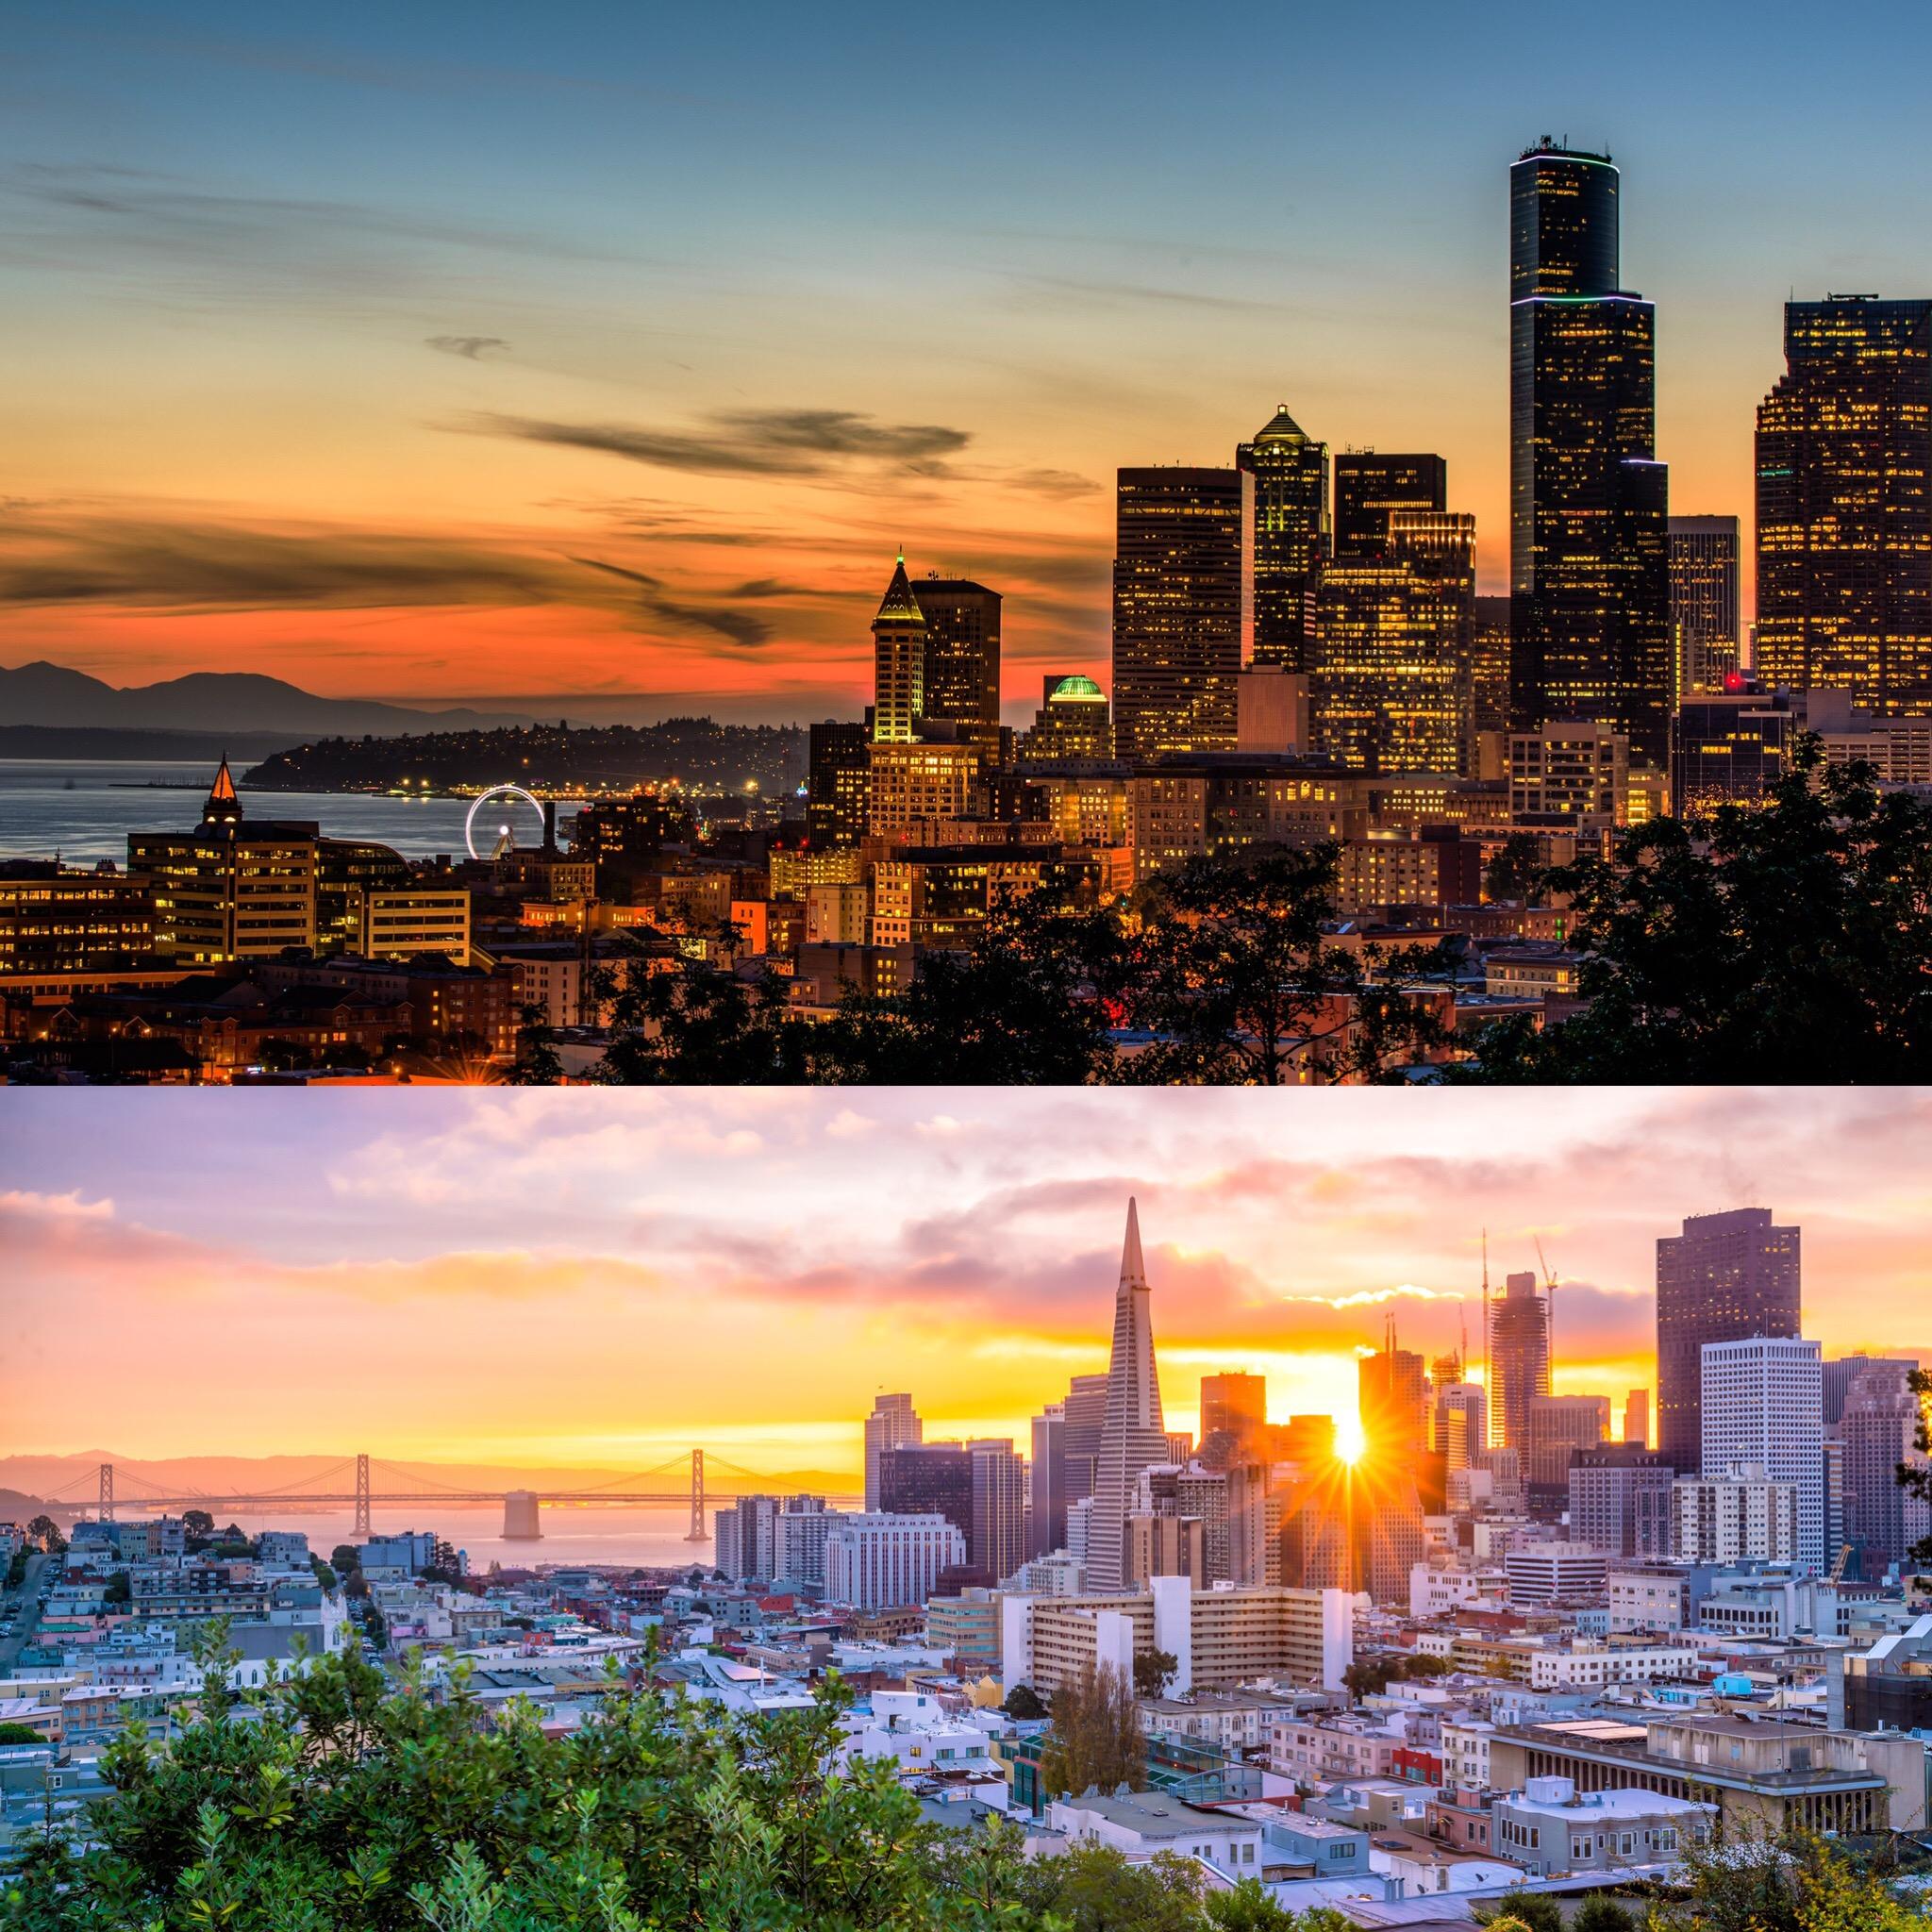 Photos (Above) Seattle (Below) San Francisco